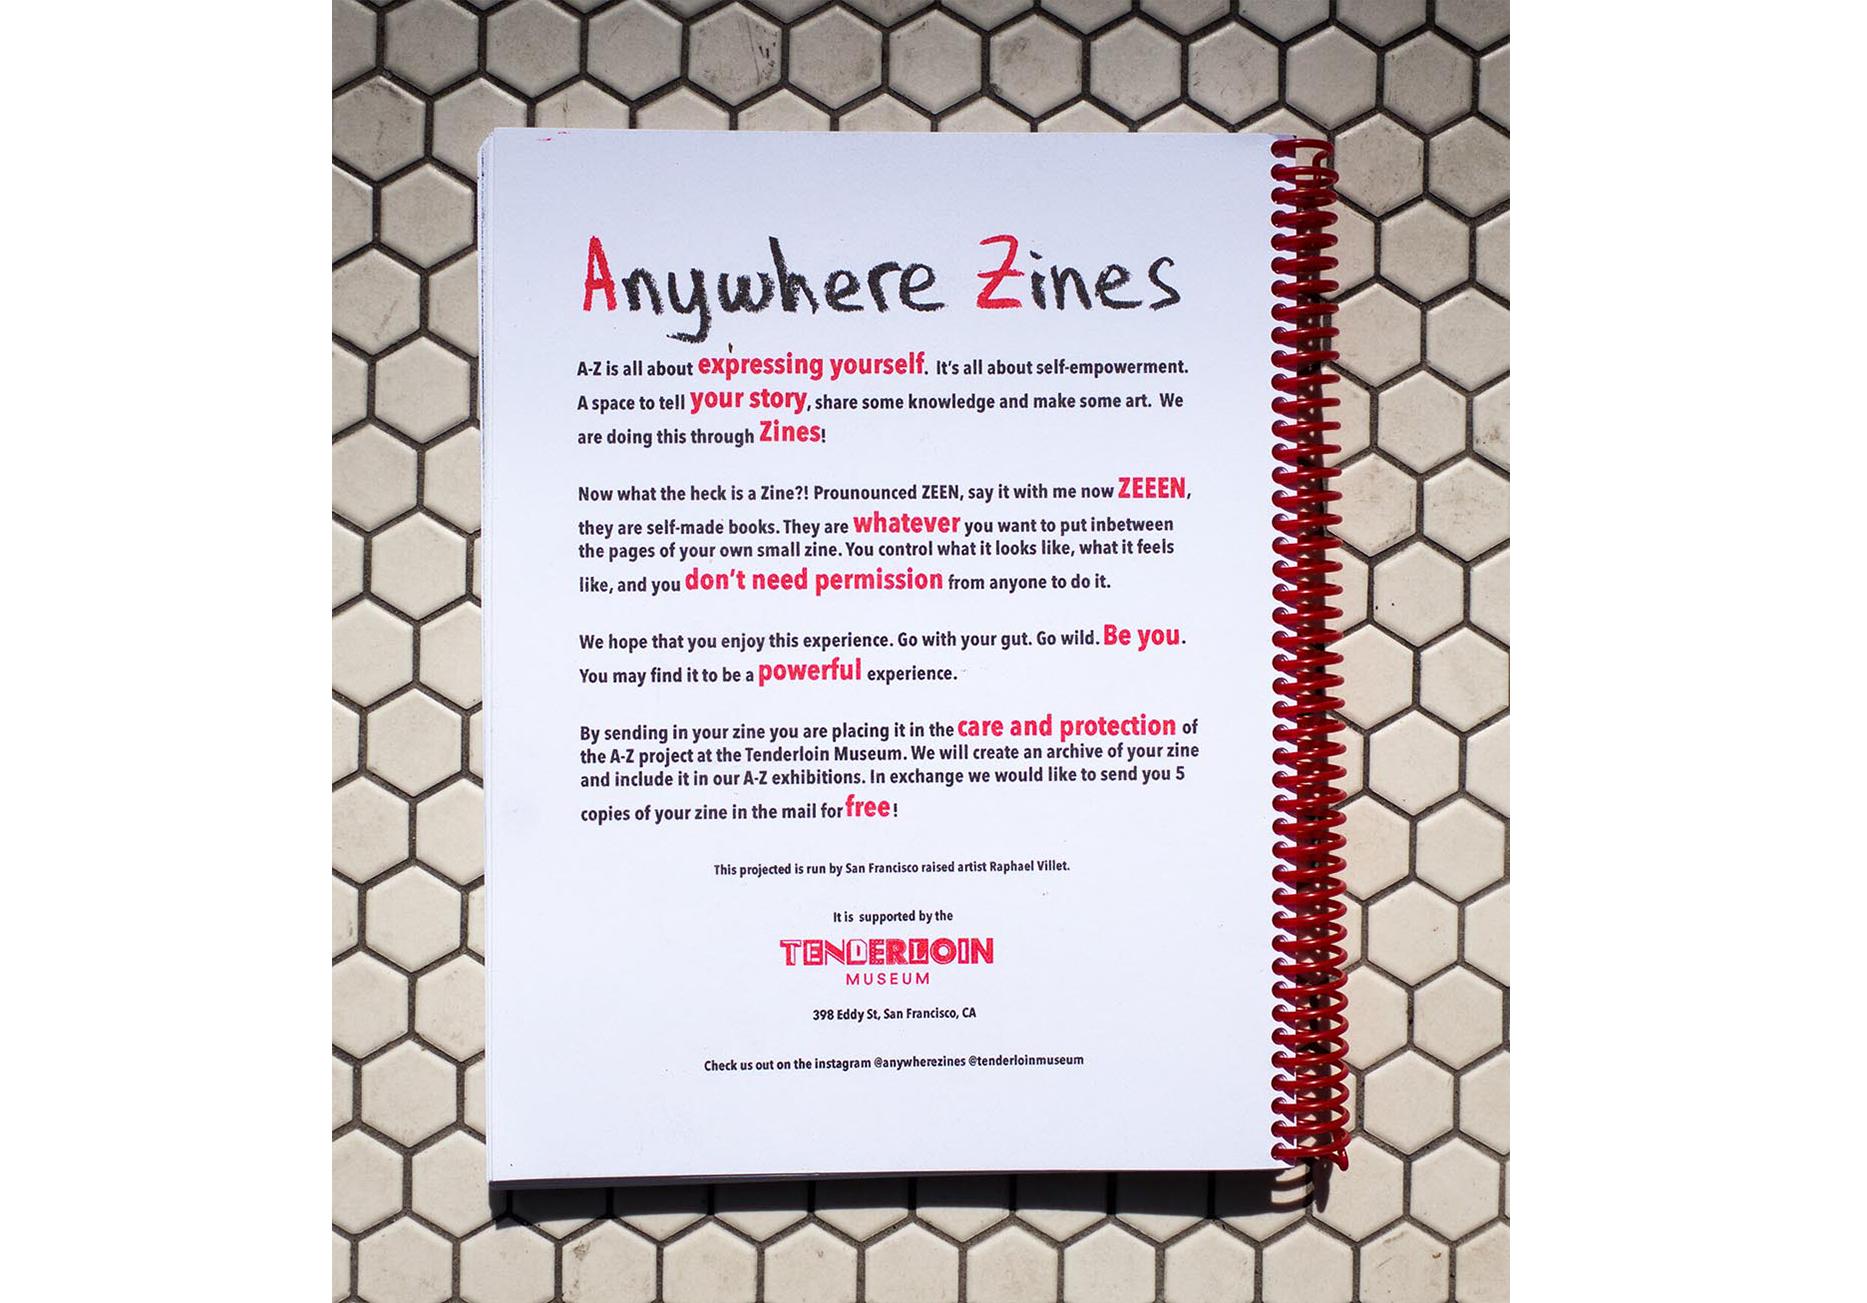 Anywhere Zines in the Tenderloin-02a.jpg